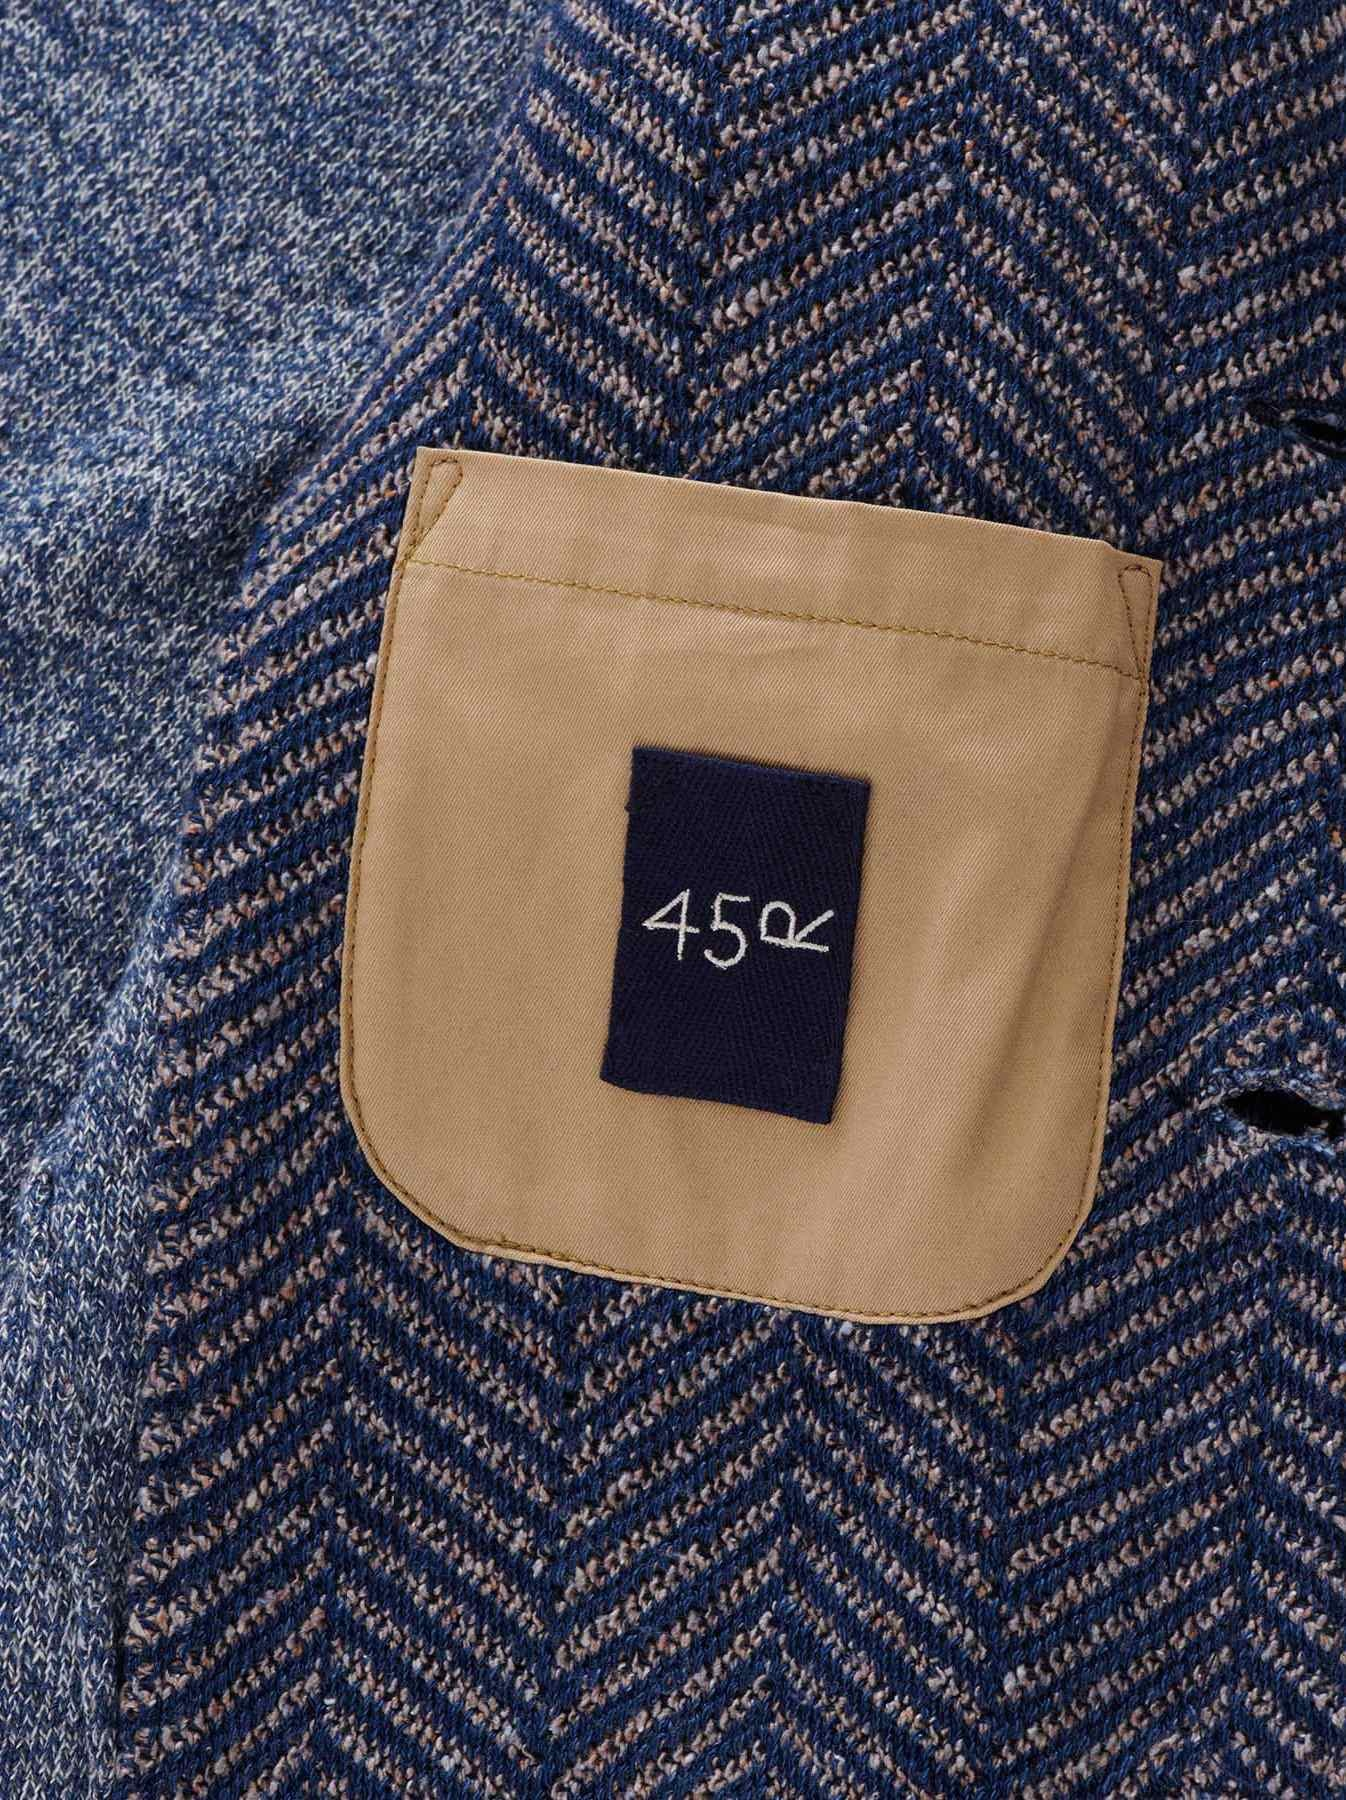 Indigo Cotton Tweed Knit Jacket-10